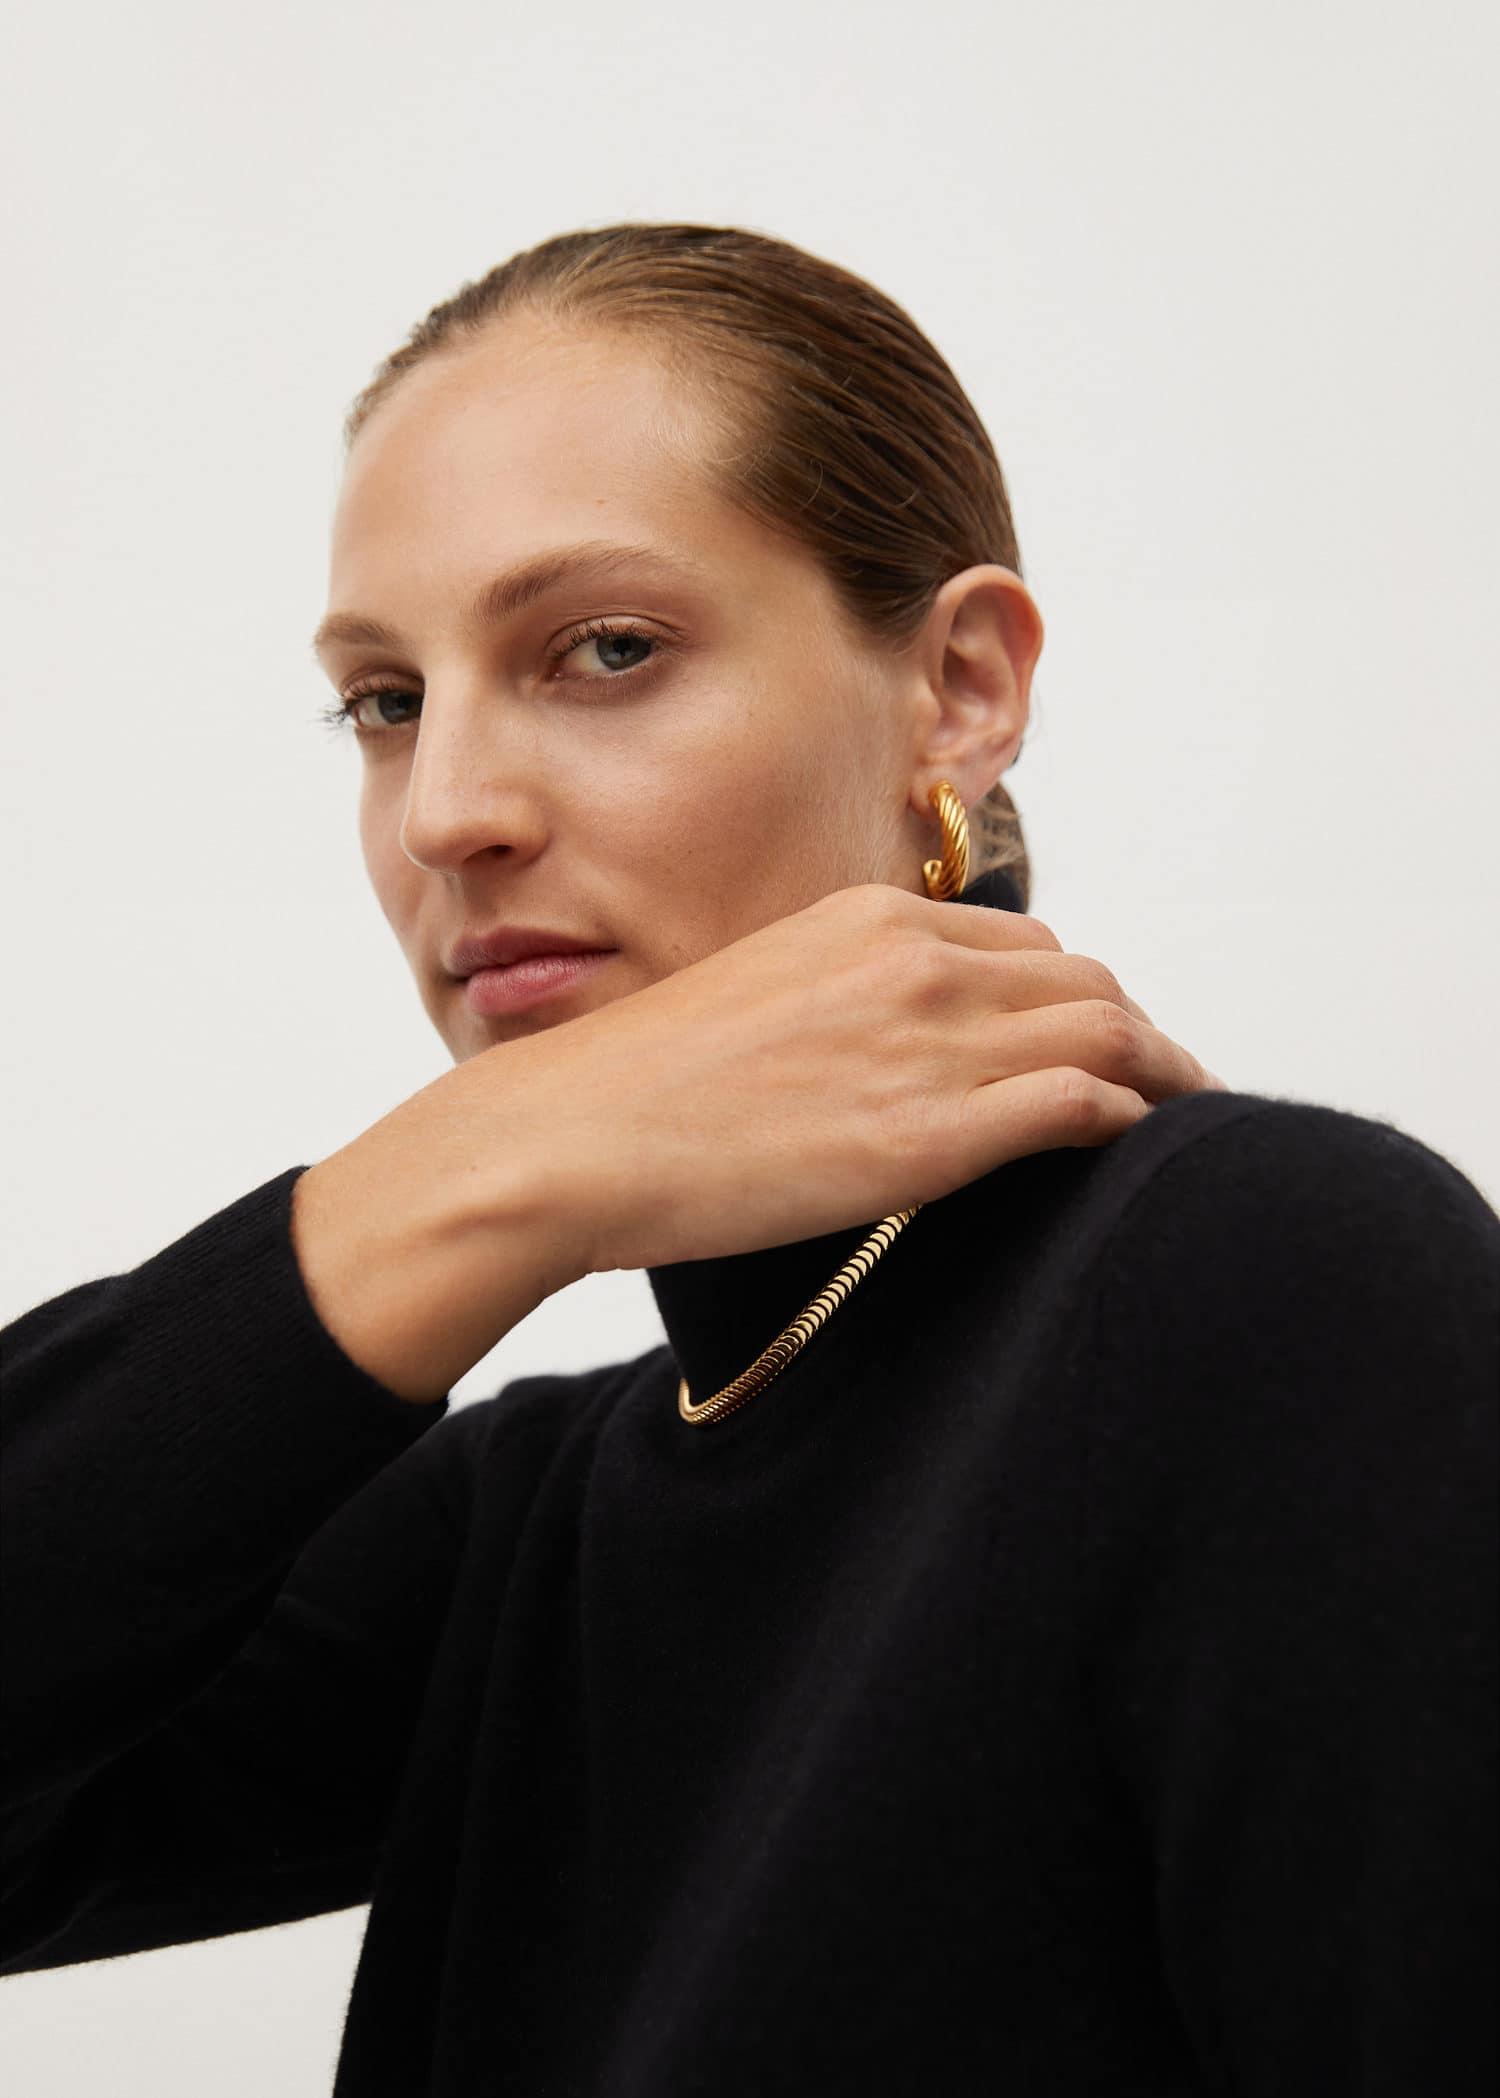 Turtleneck cashmere sweater Woman | Mango Kosovo